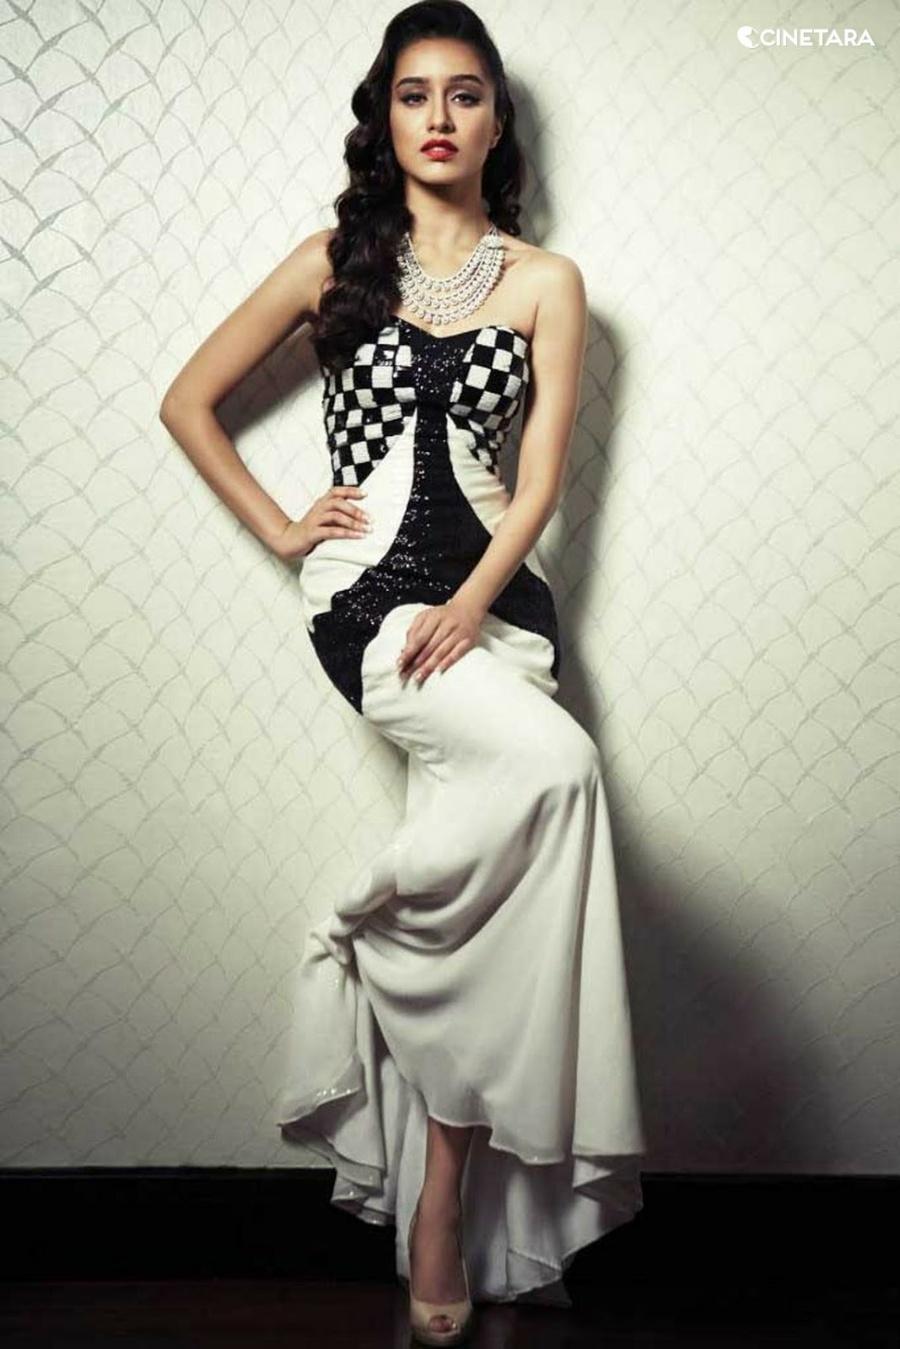 Shraddha Kapoor Best Photo Gallery - Filmnstars-2068